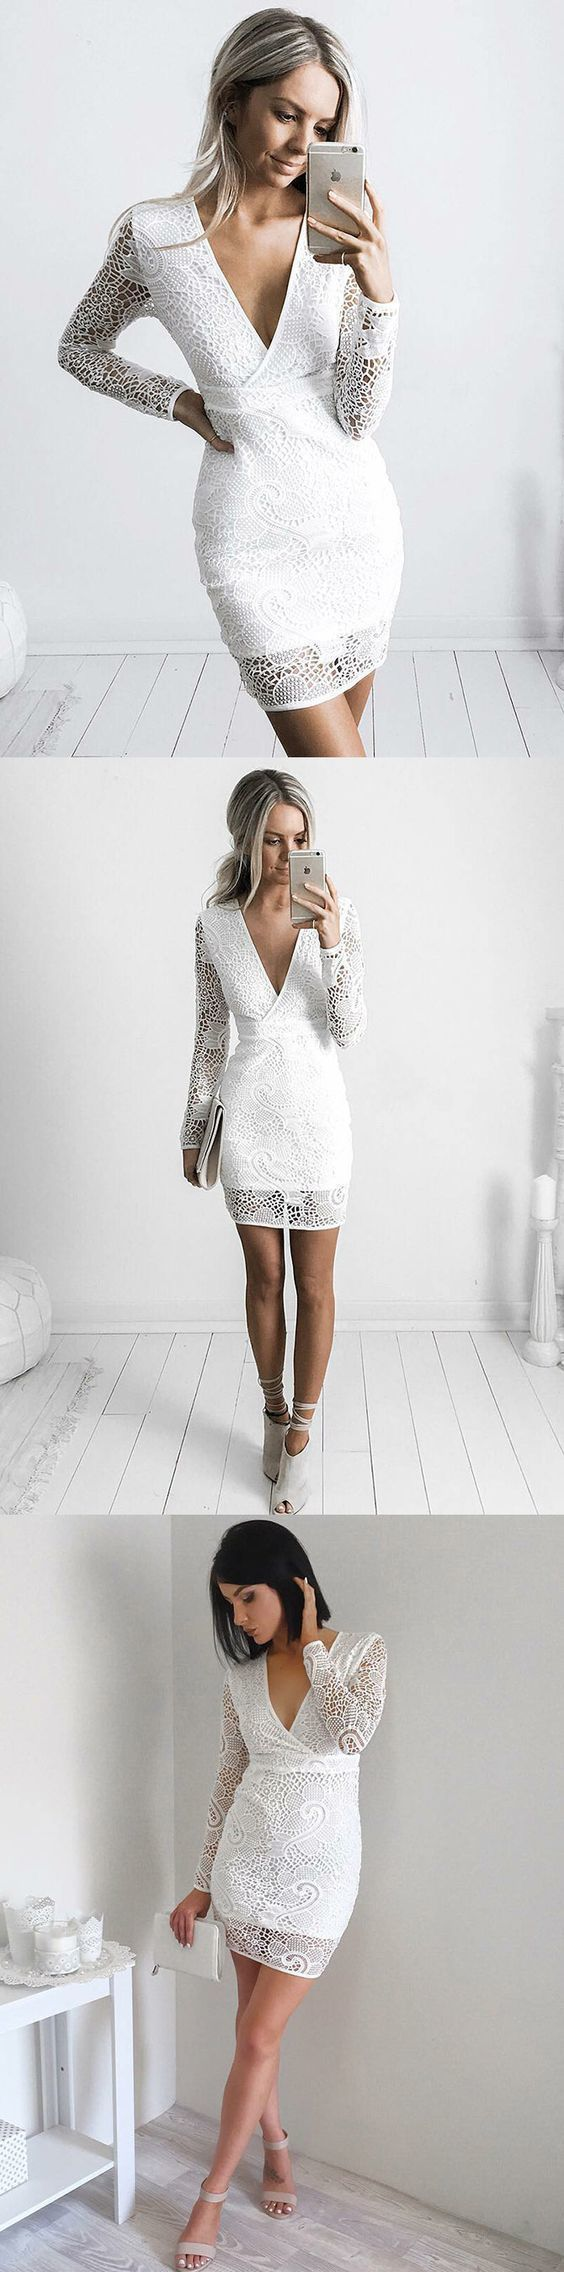 706253b49c1 Sheath V-Neck Long Sleeves Short White Lace Homecoming Cocktail Dress